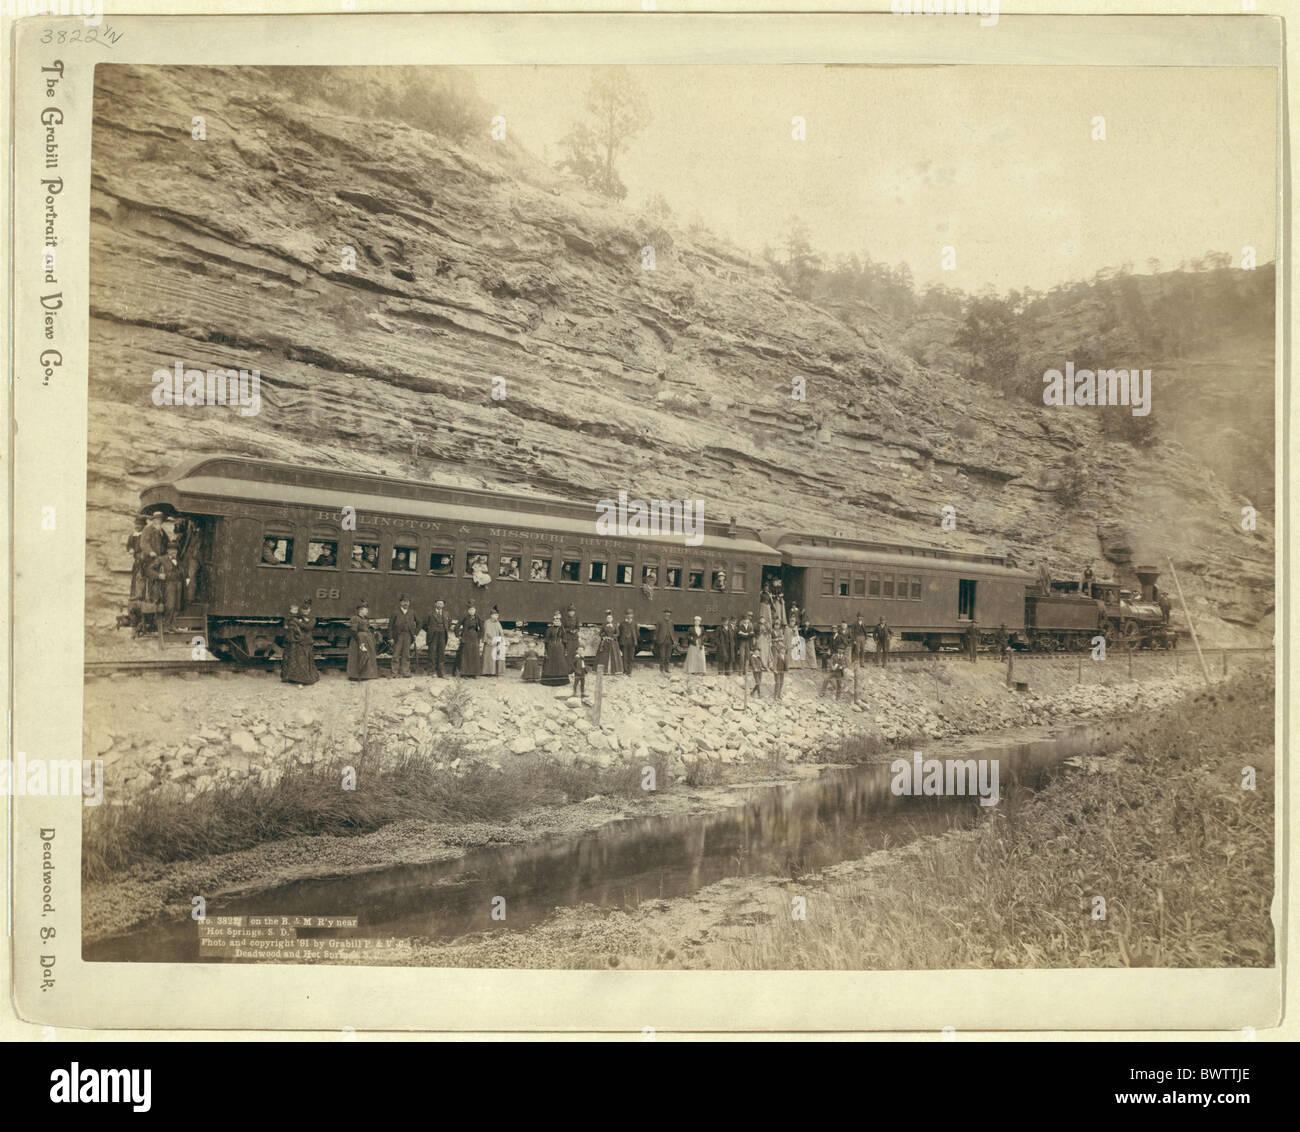 USA America United States North America Hot Springs South Dakota wild west 1890 railroad passengers United S - Stock Image